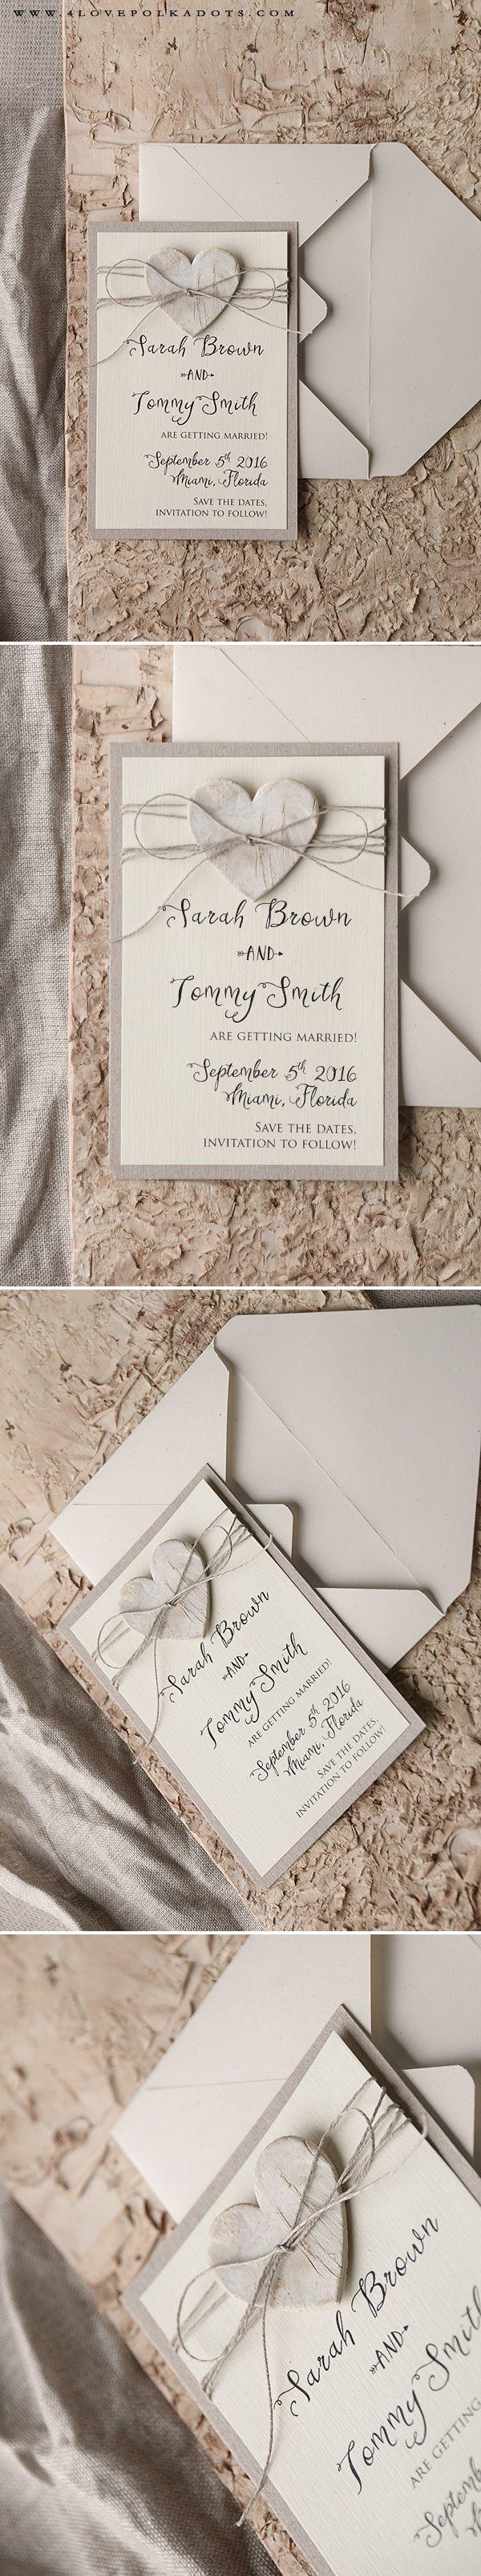 274 Best Wedding Invitations Images On Pinterest Bow Wedding